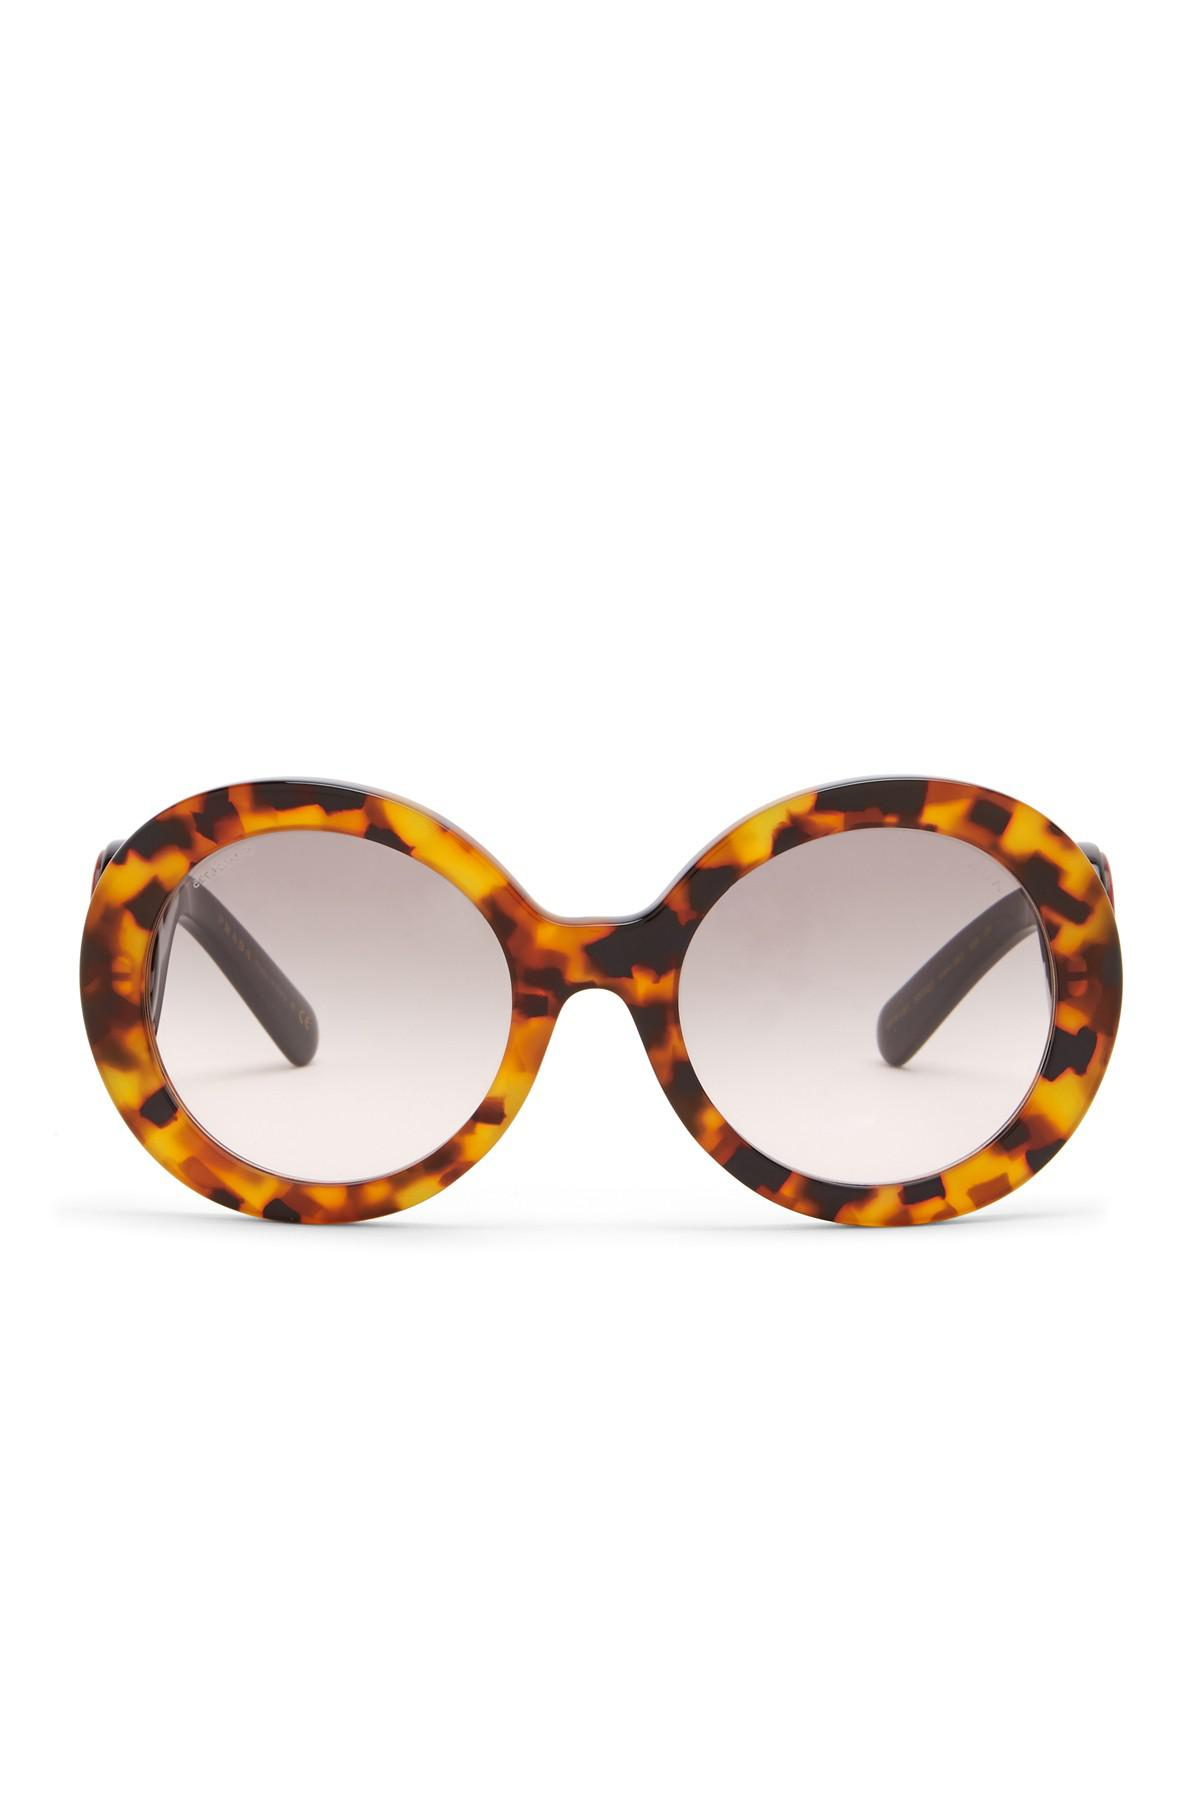 59d75cbc45abf ... new zealand lyst prada womens 55mm round catwalk minimal baroque  sunglasses ea3e5 aa050